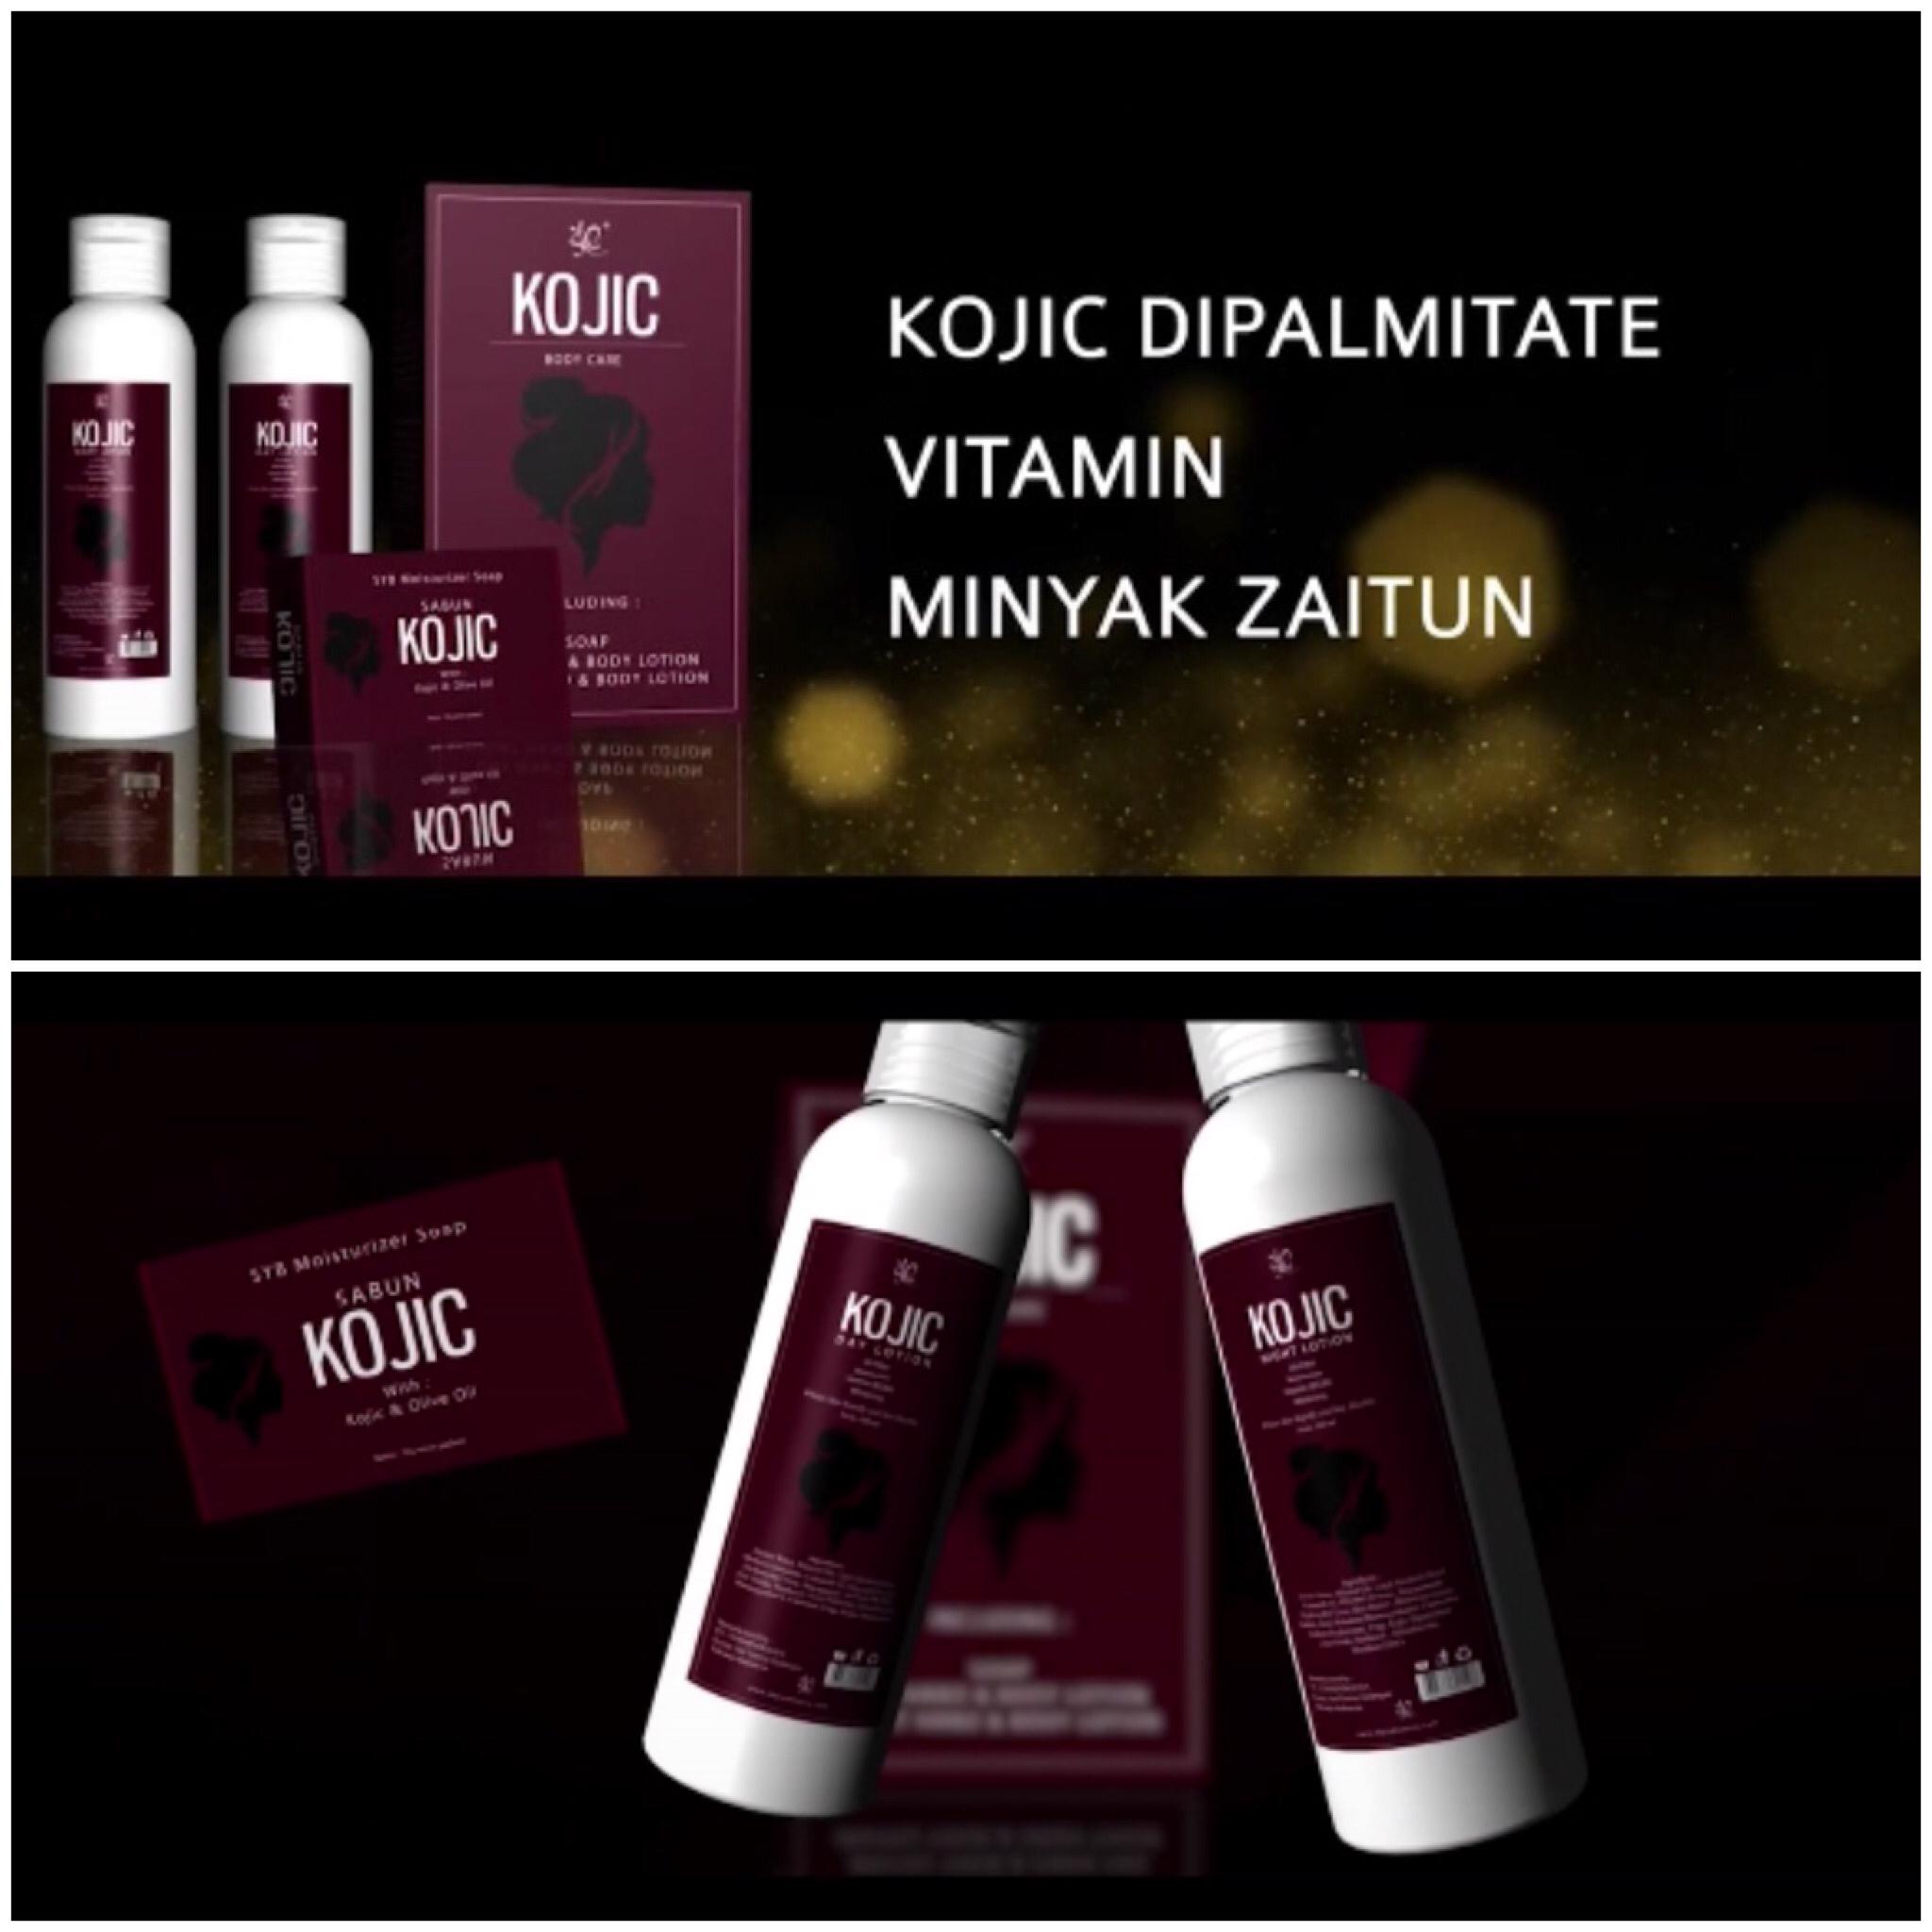 Bpom Paket Kojic 3 In 1 Body Care By Syb Pemutih Bulma Shop Kosmetik Hanasui 3in1 Lotion Original